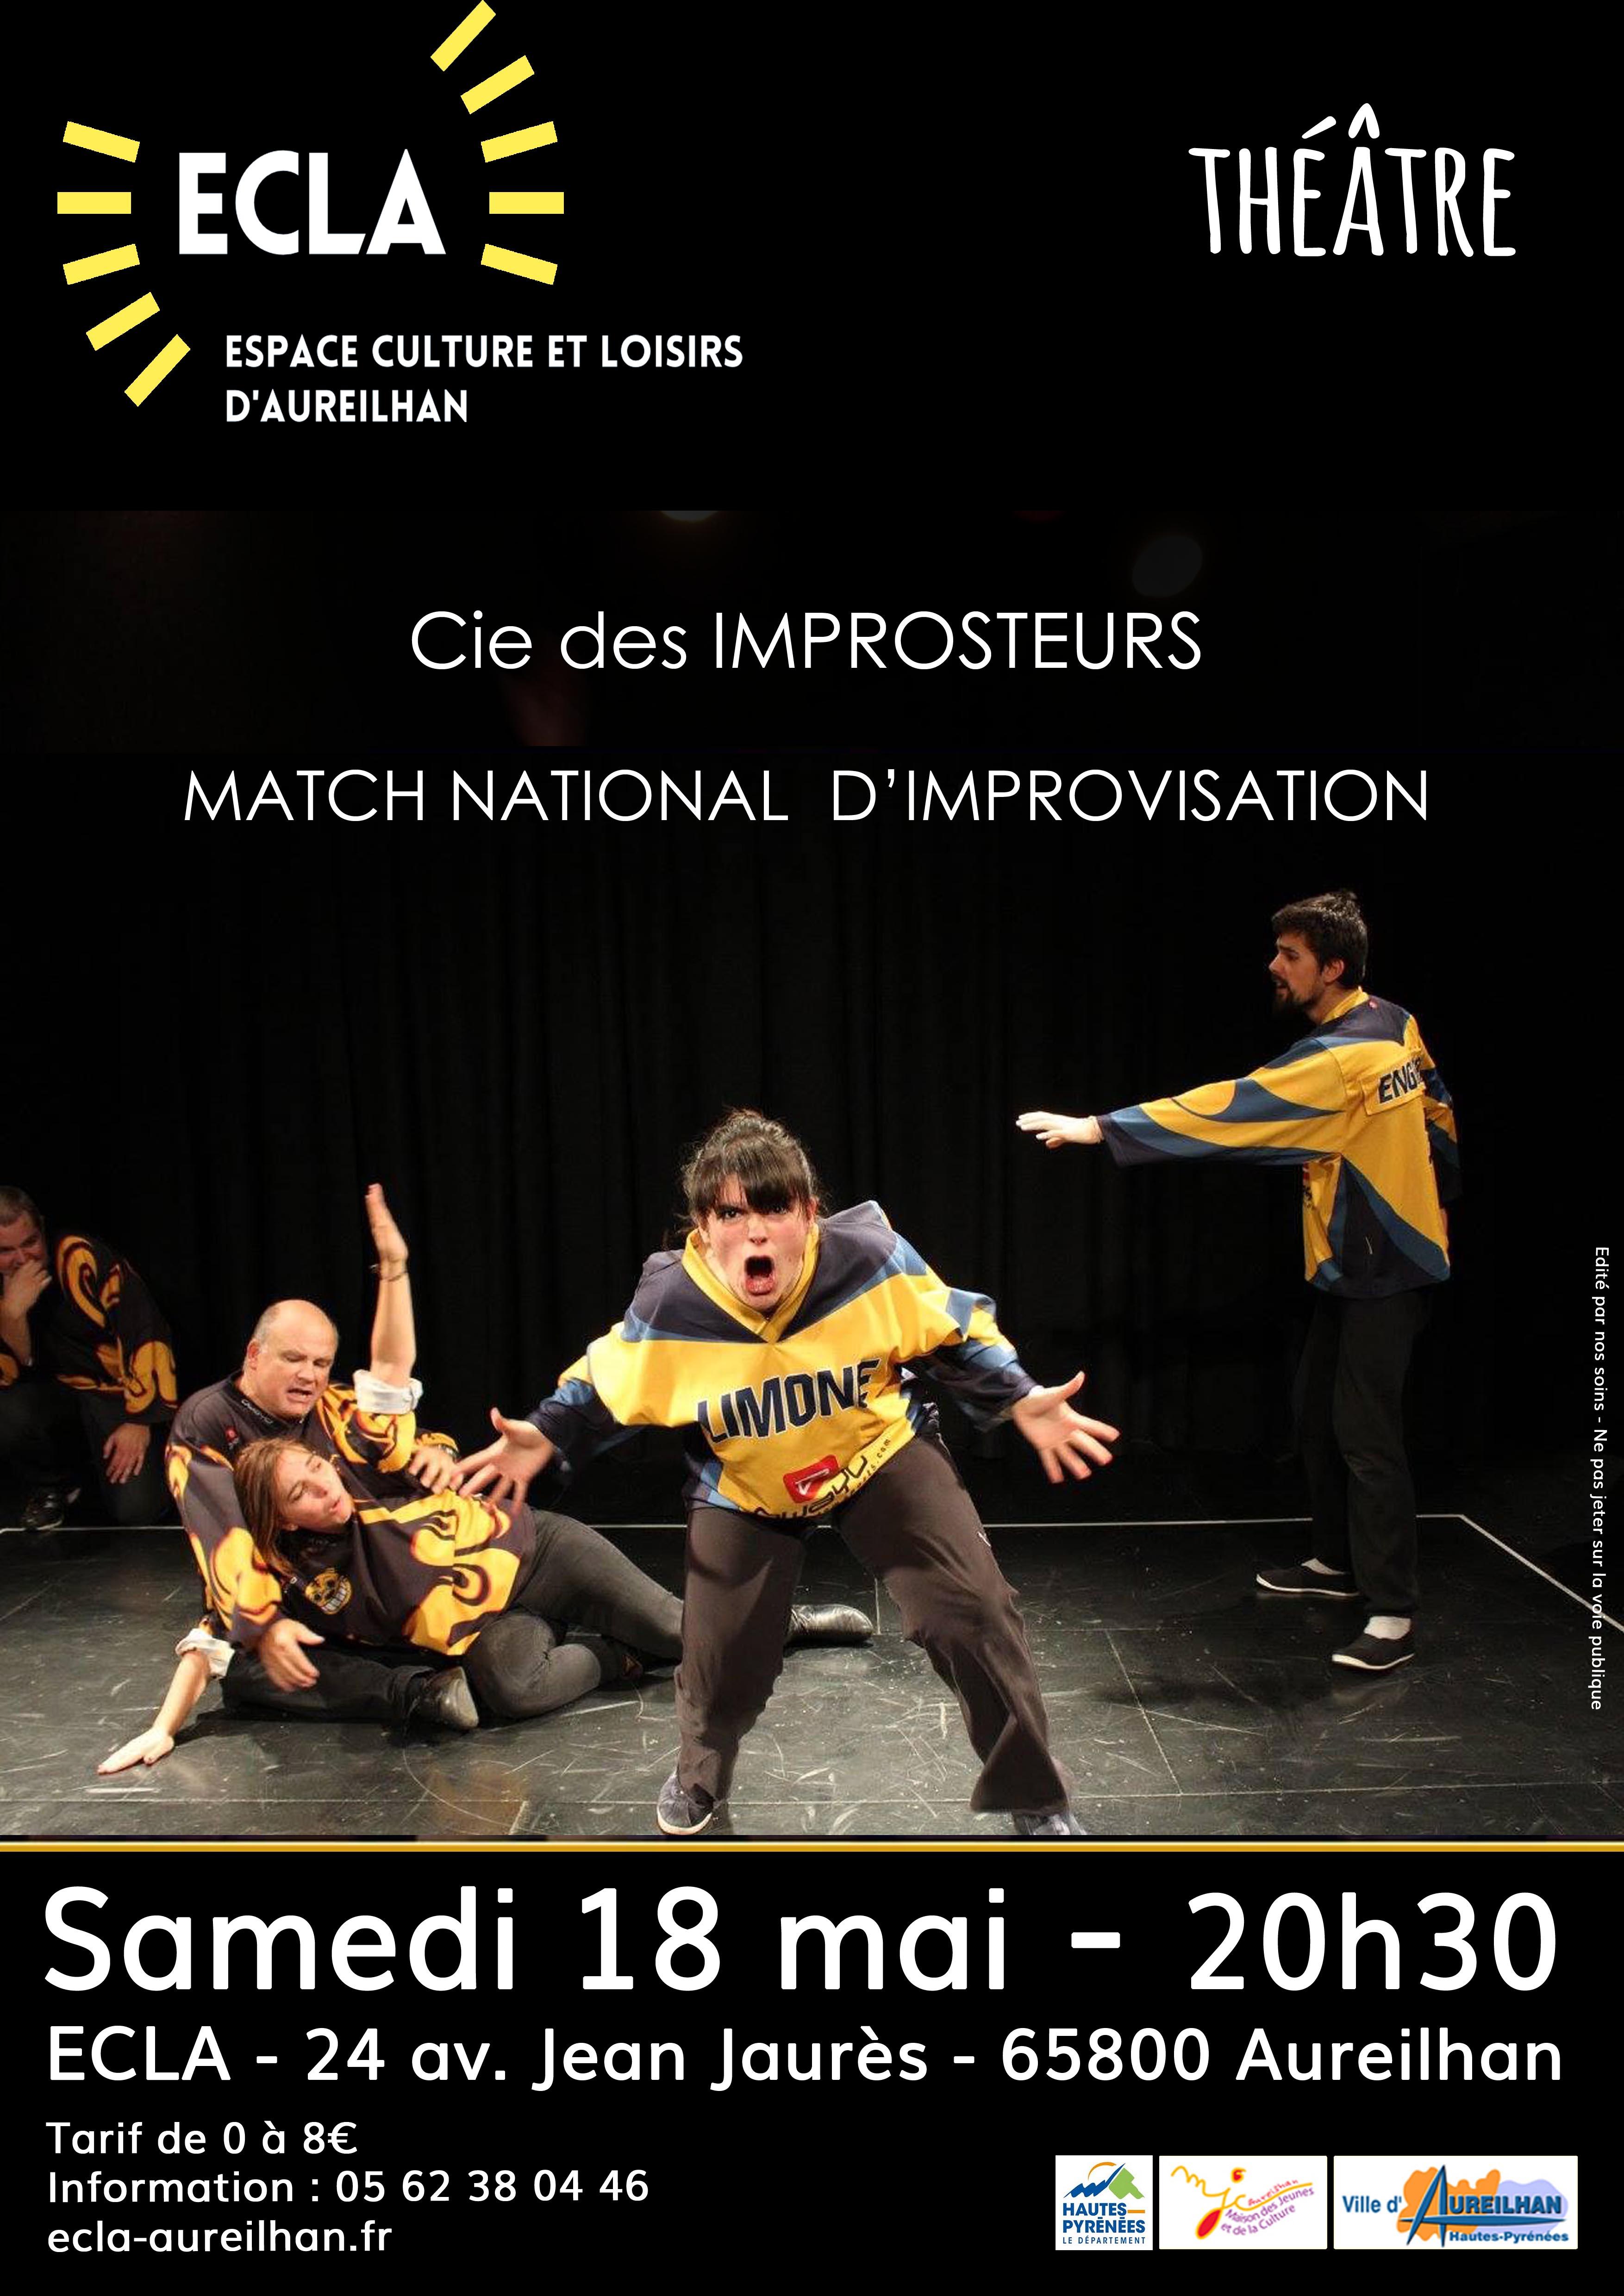 « Match National d'Improvisation »